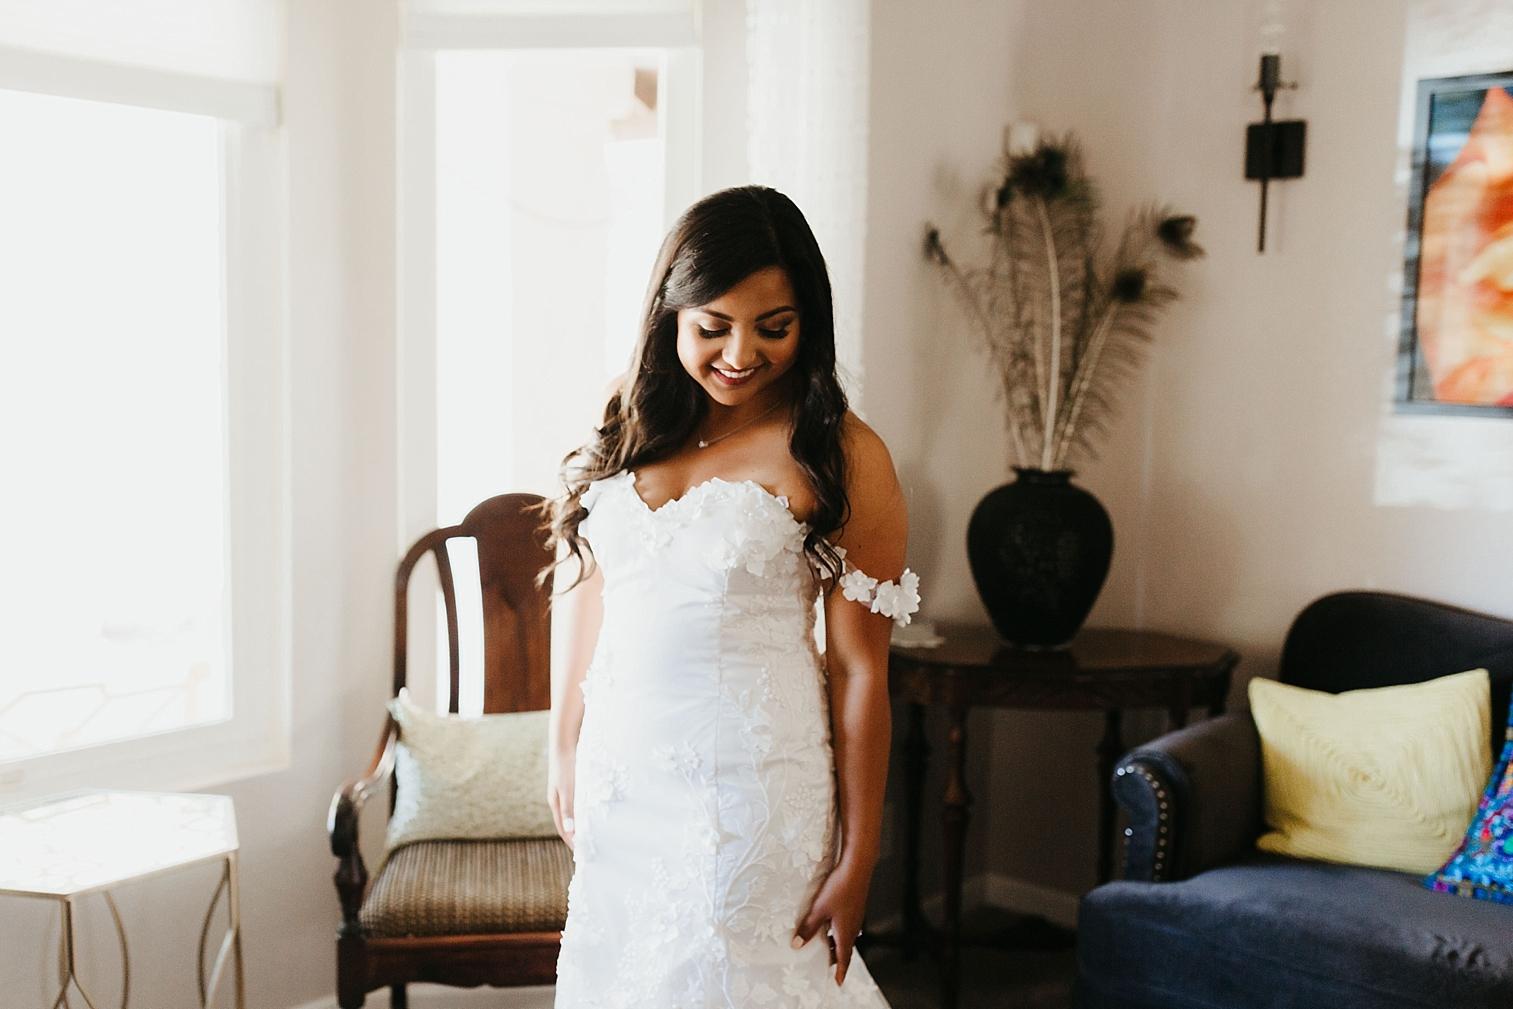 Escondido-Backyard-Wedding-8.jpg